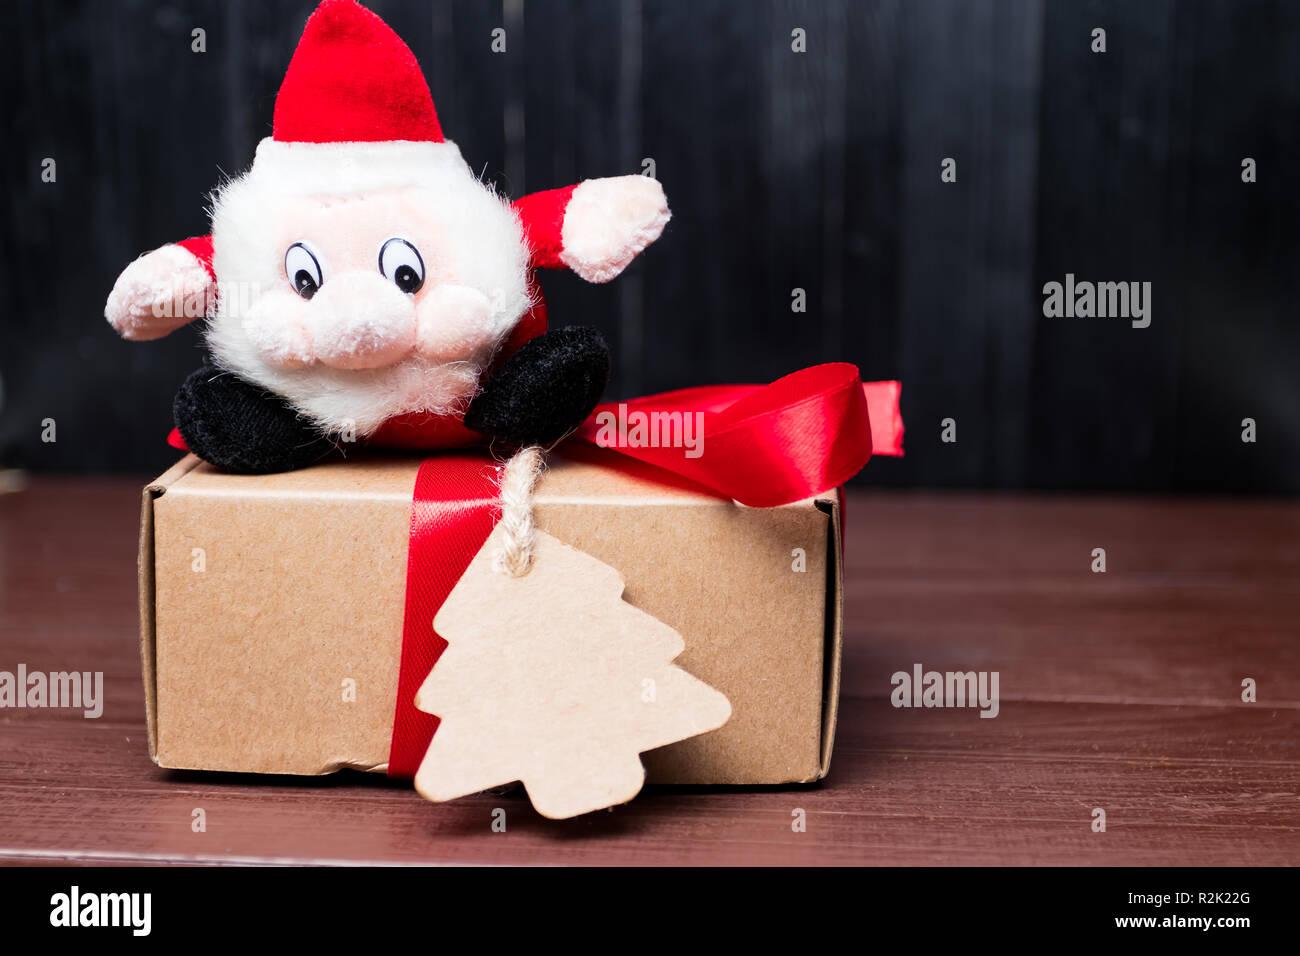 Funny Santa Claus Gift Wishes Stock Photos & Funny Santa Claus Gift ...